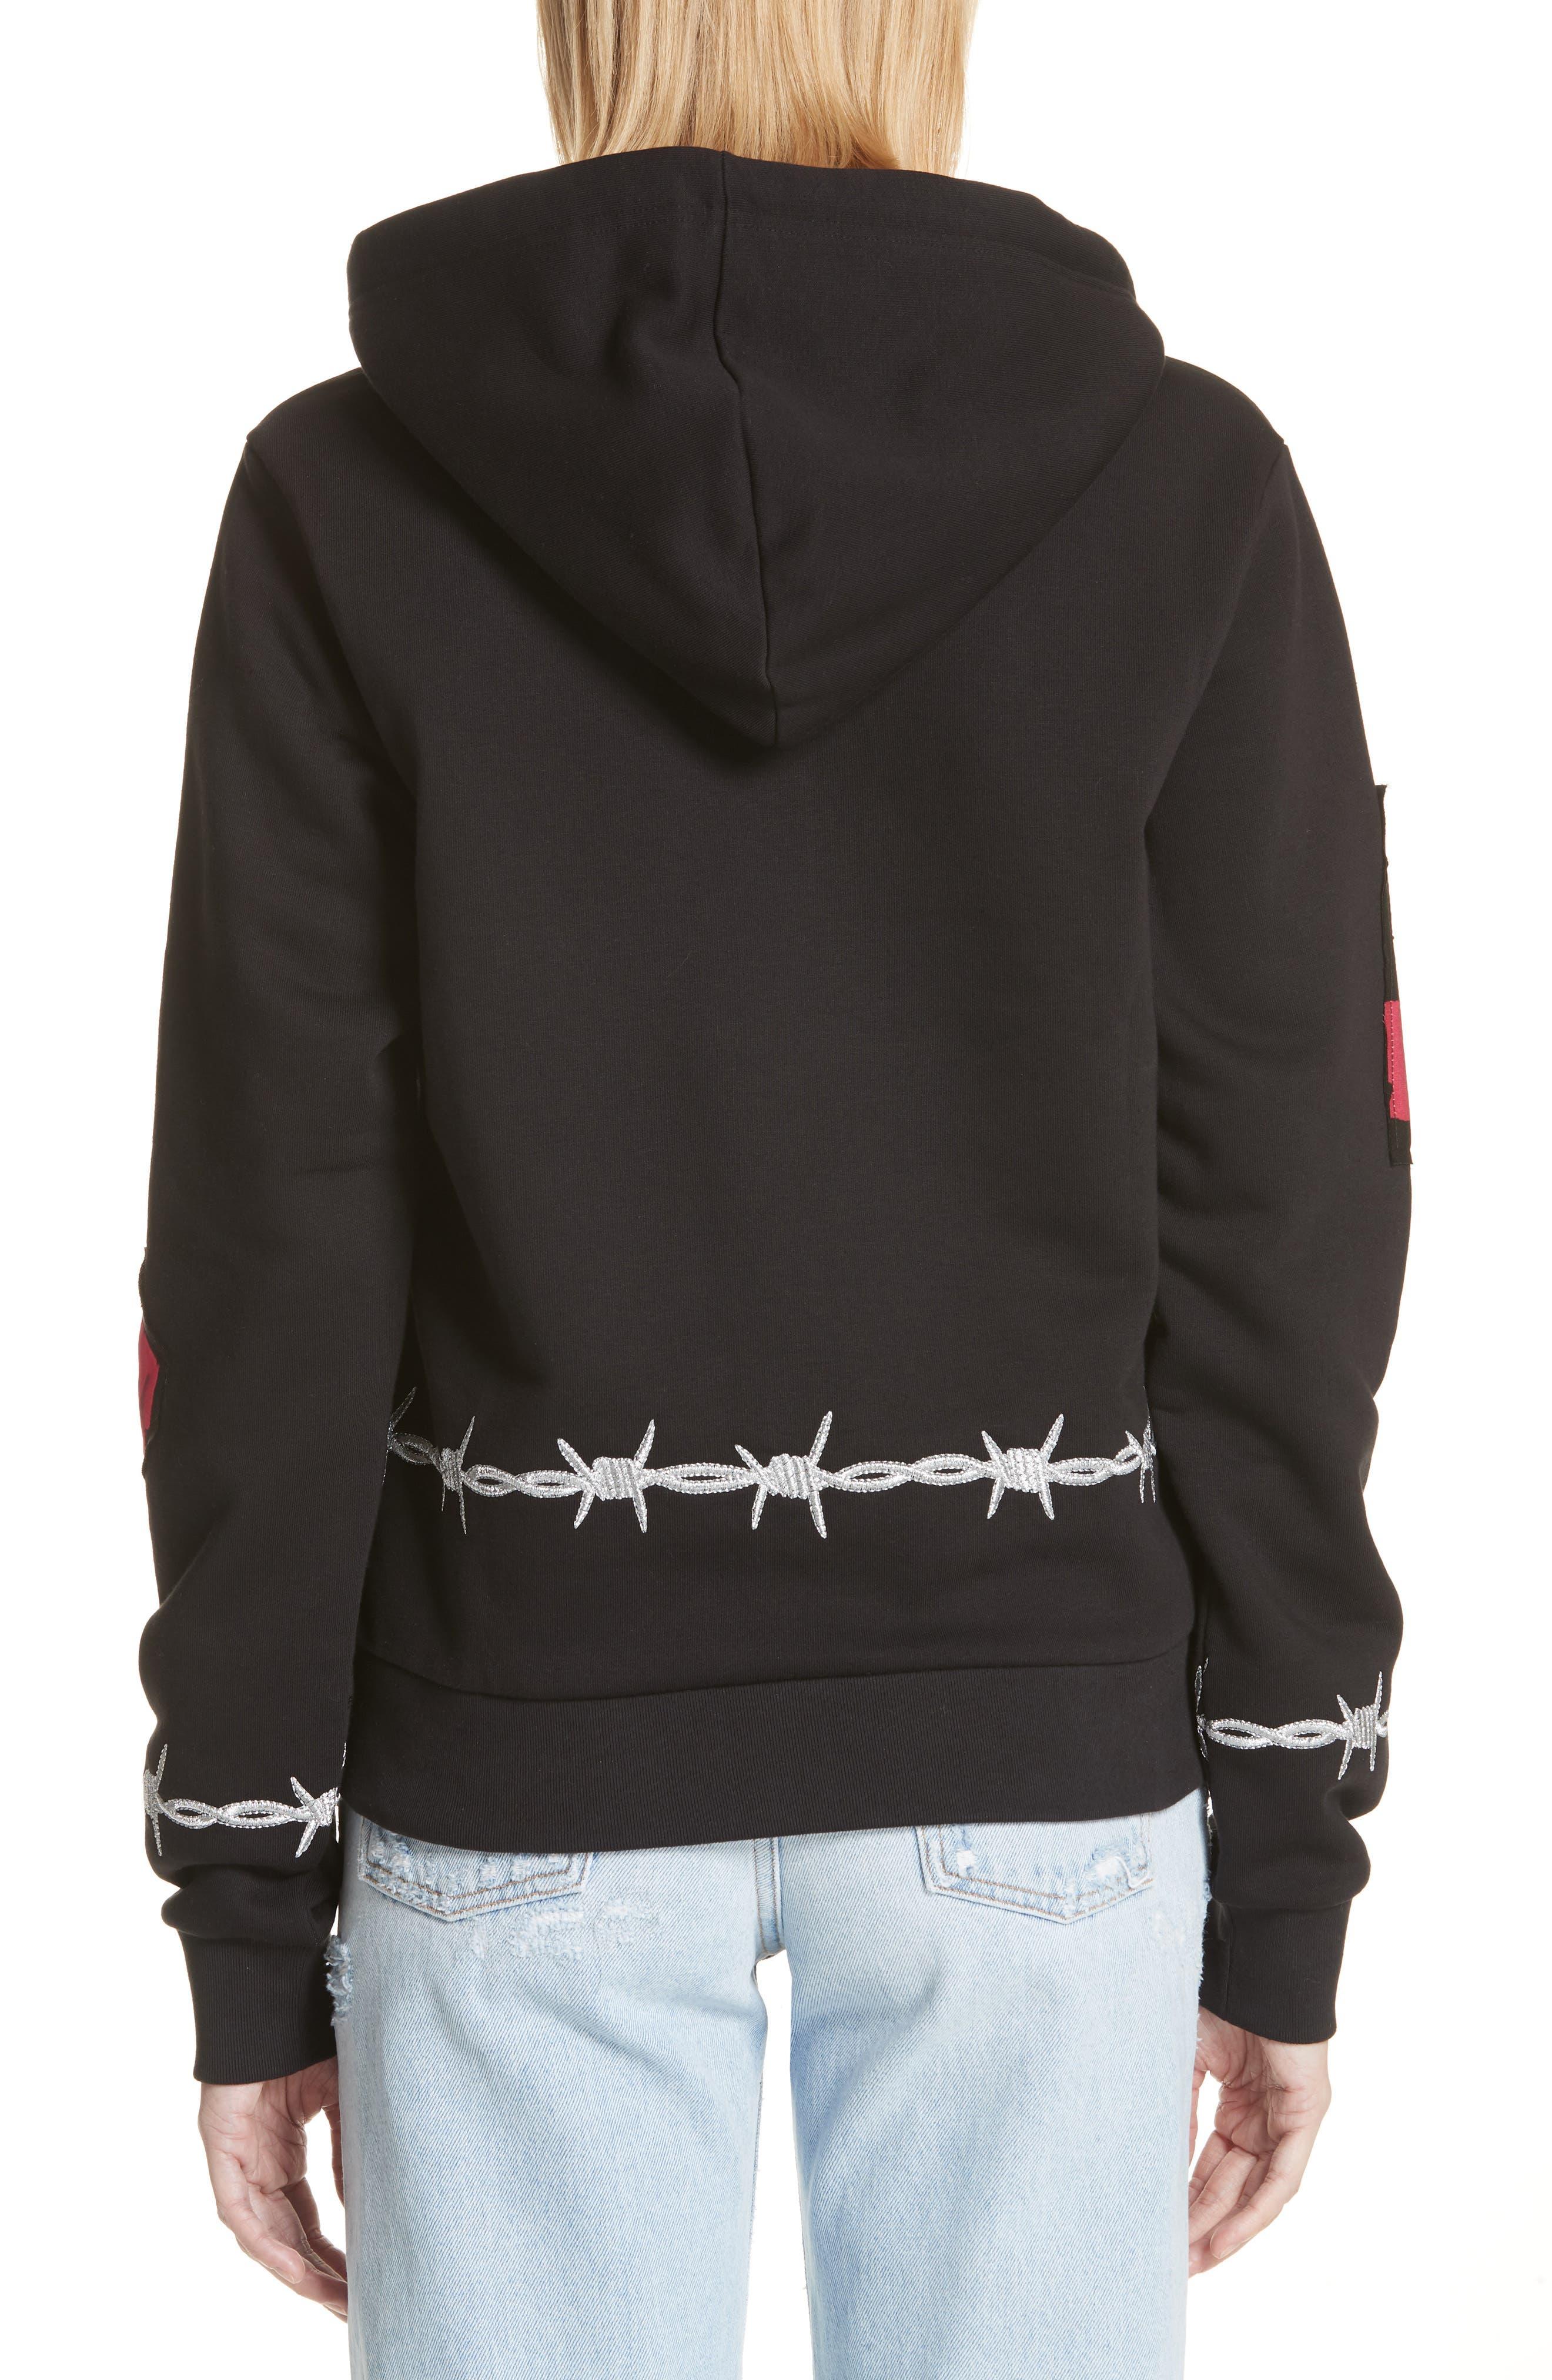 Protester Sweatshirt,                             Alternate thumbnail 2, color,                             Black